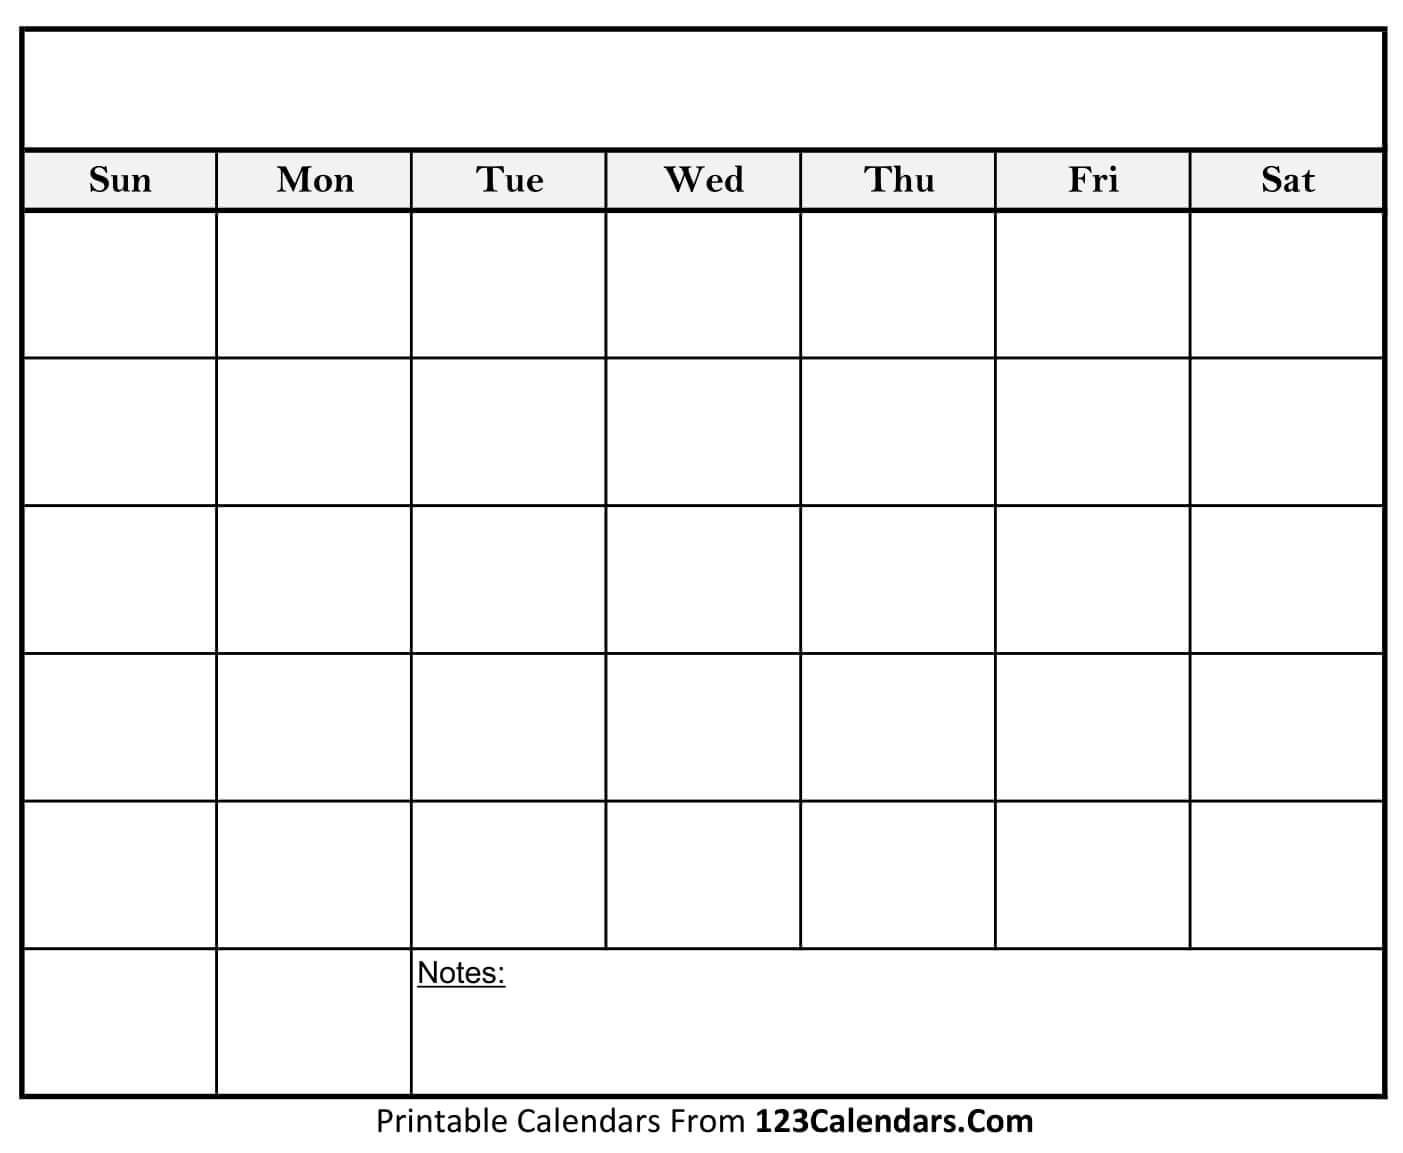 Printable Blank Calendar Templates - 123Calendars in Fill In Blank Calendar Templates